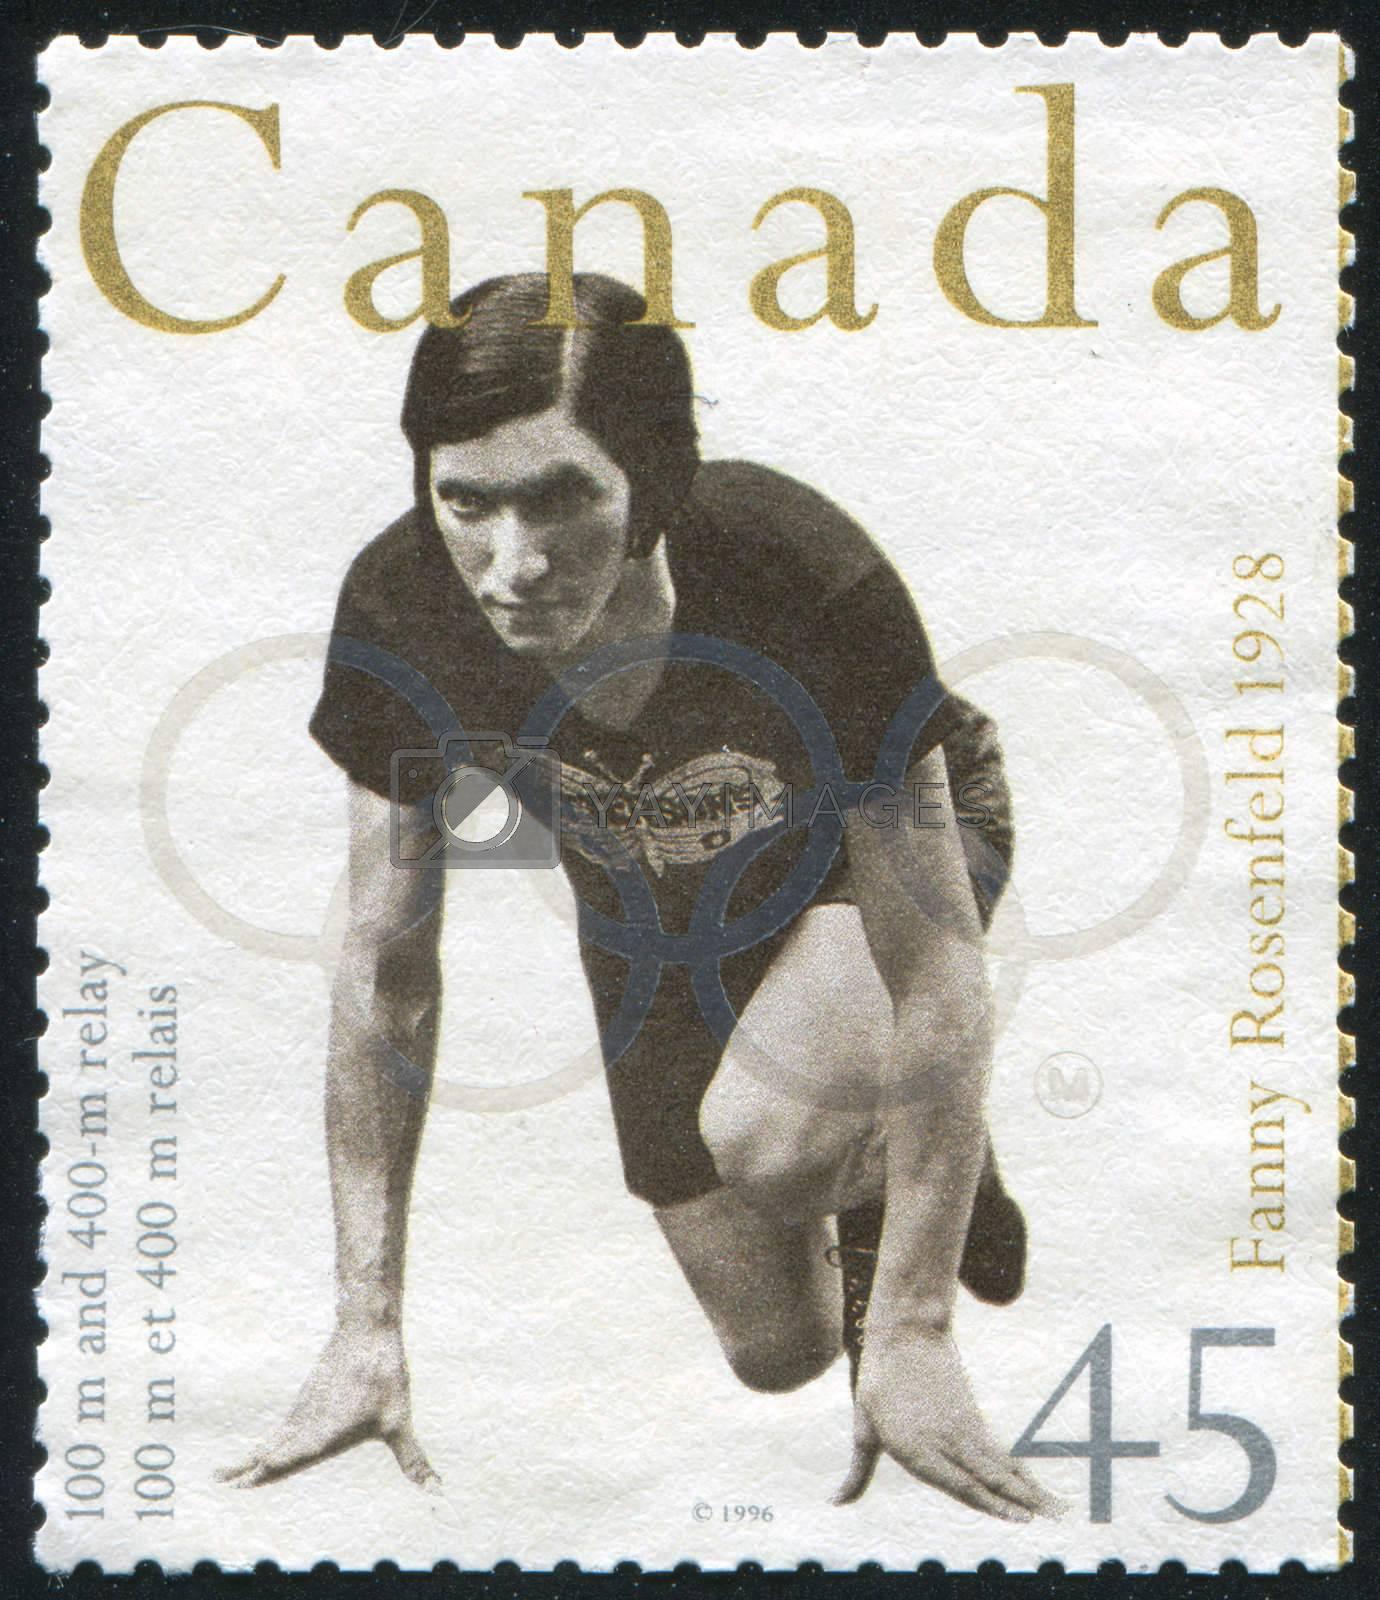 CANADA - CIRCA 1996: stamp printed by Canada, shows Fanny Rosenfeld, circa 1996